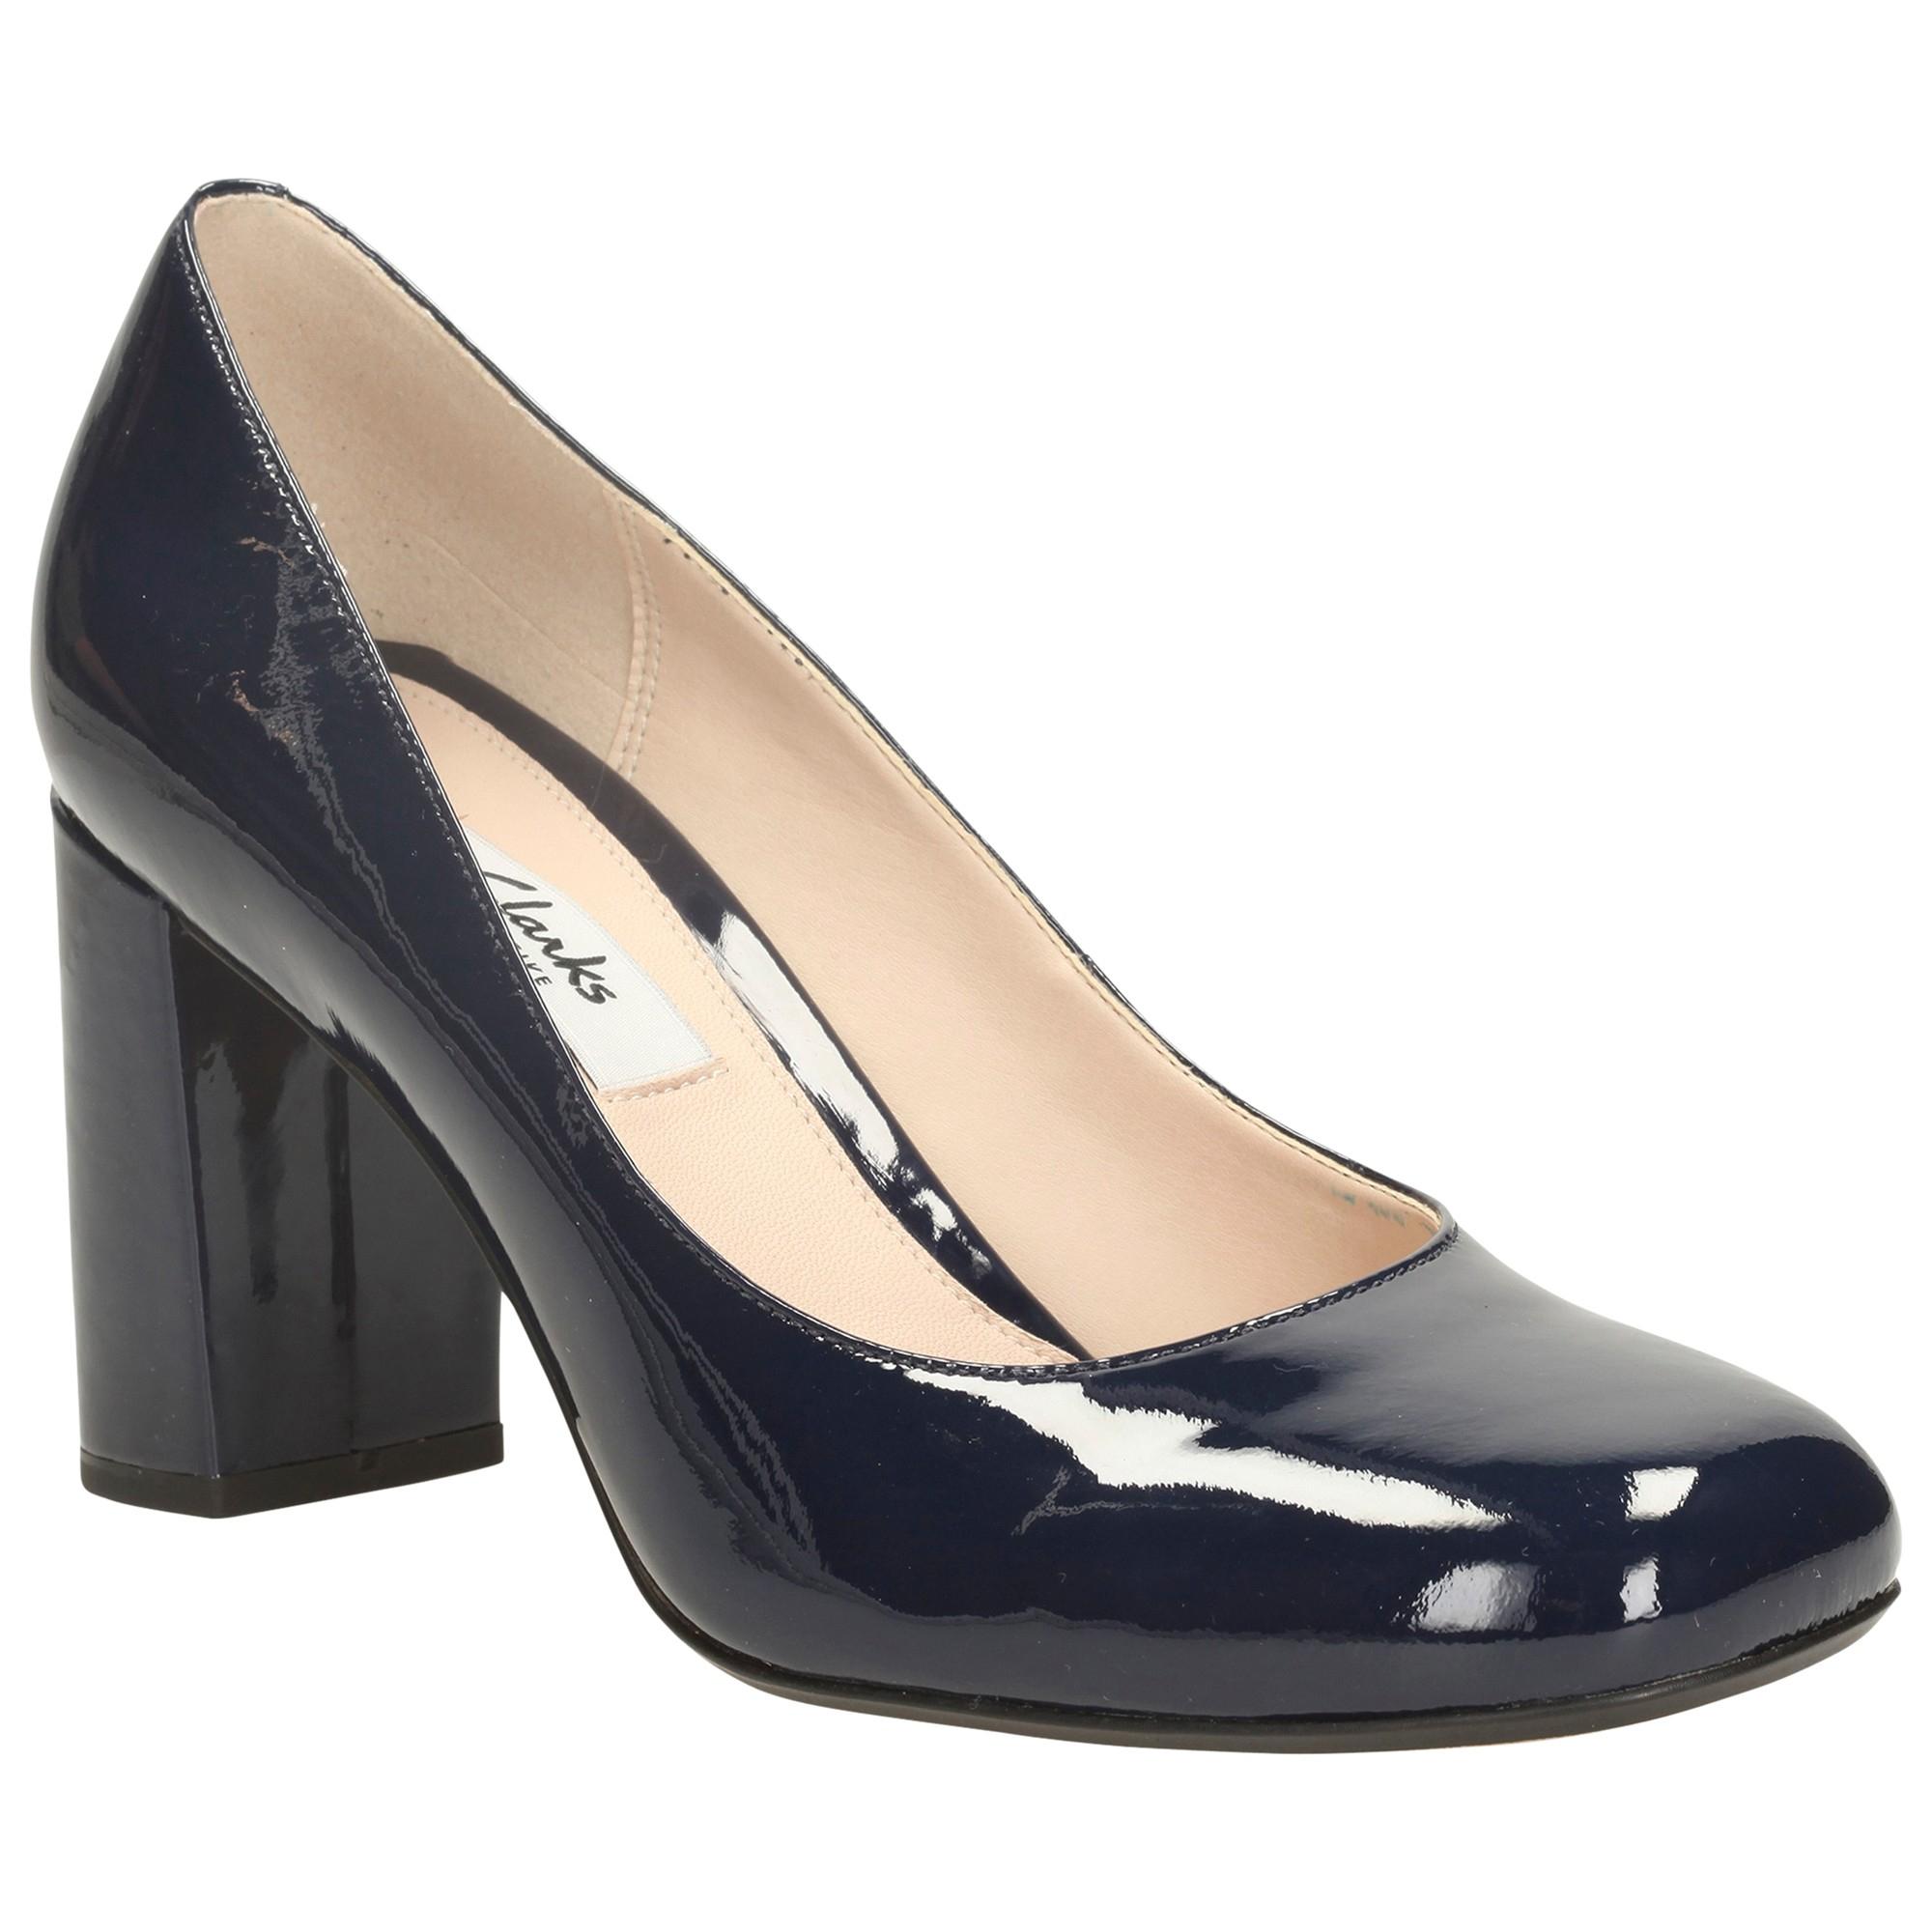 8c072d5c74b Red High Heels For Women